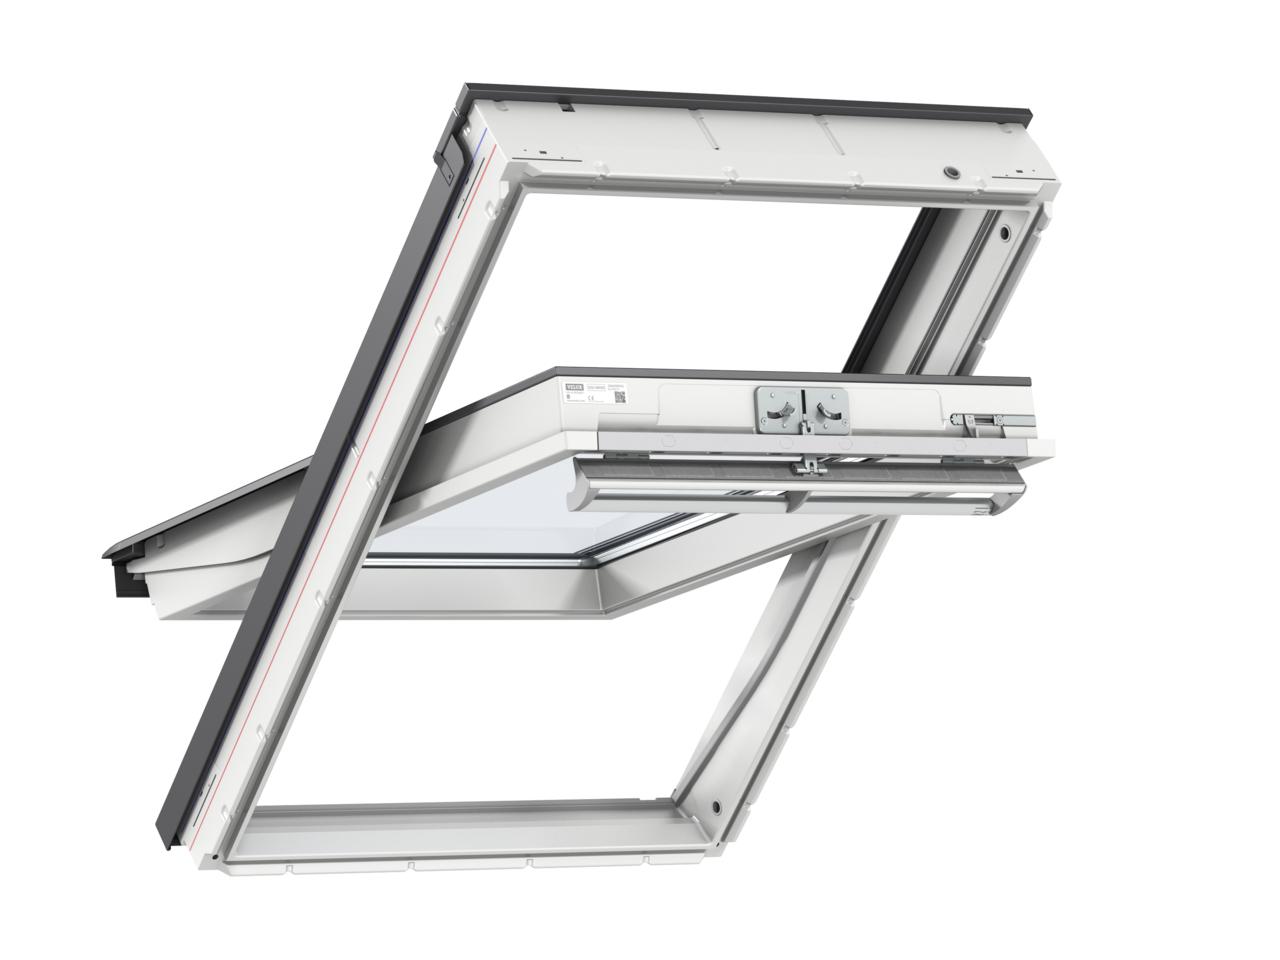 Velux GGU UK04 1340 x 980mm Centre Pivot 34Pane Roof Window - White Polyurethane